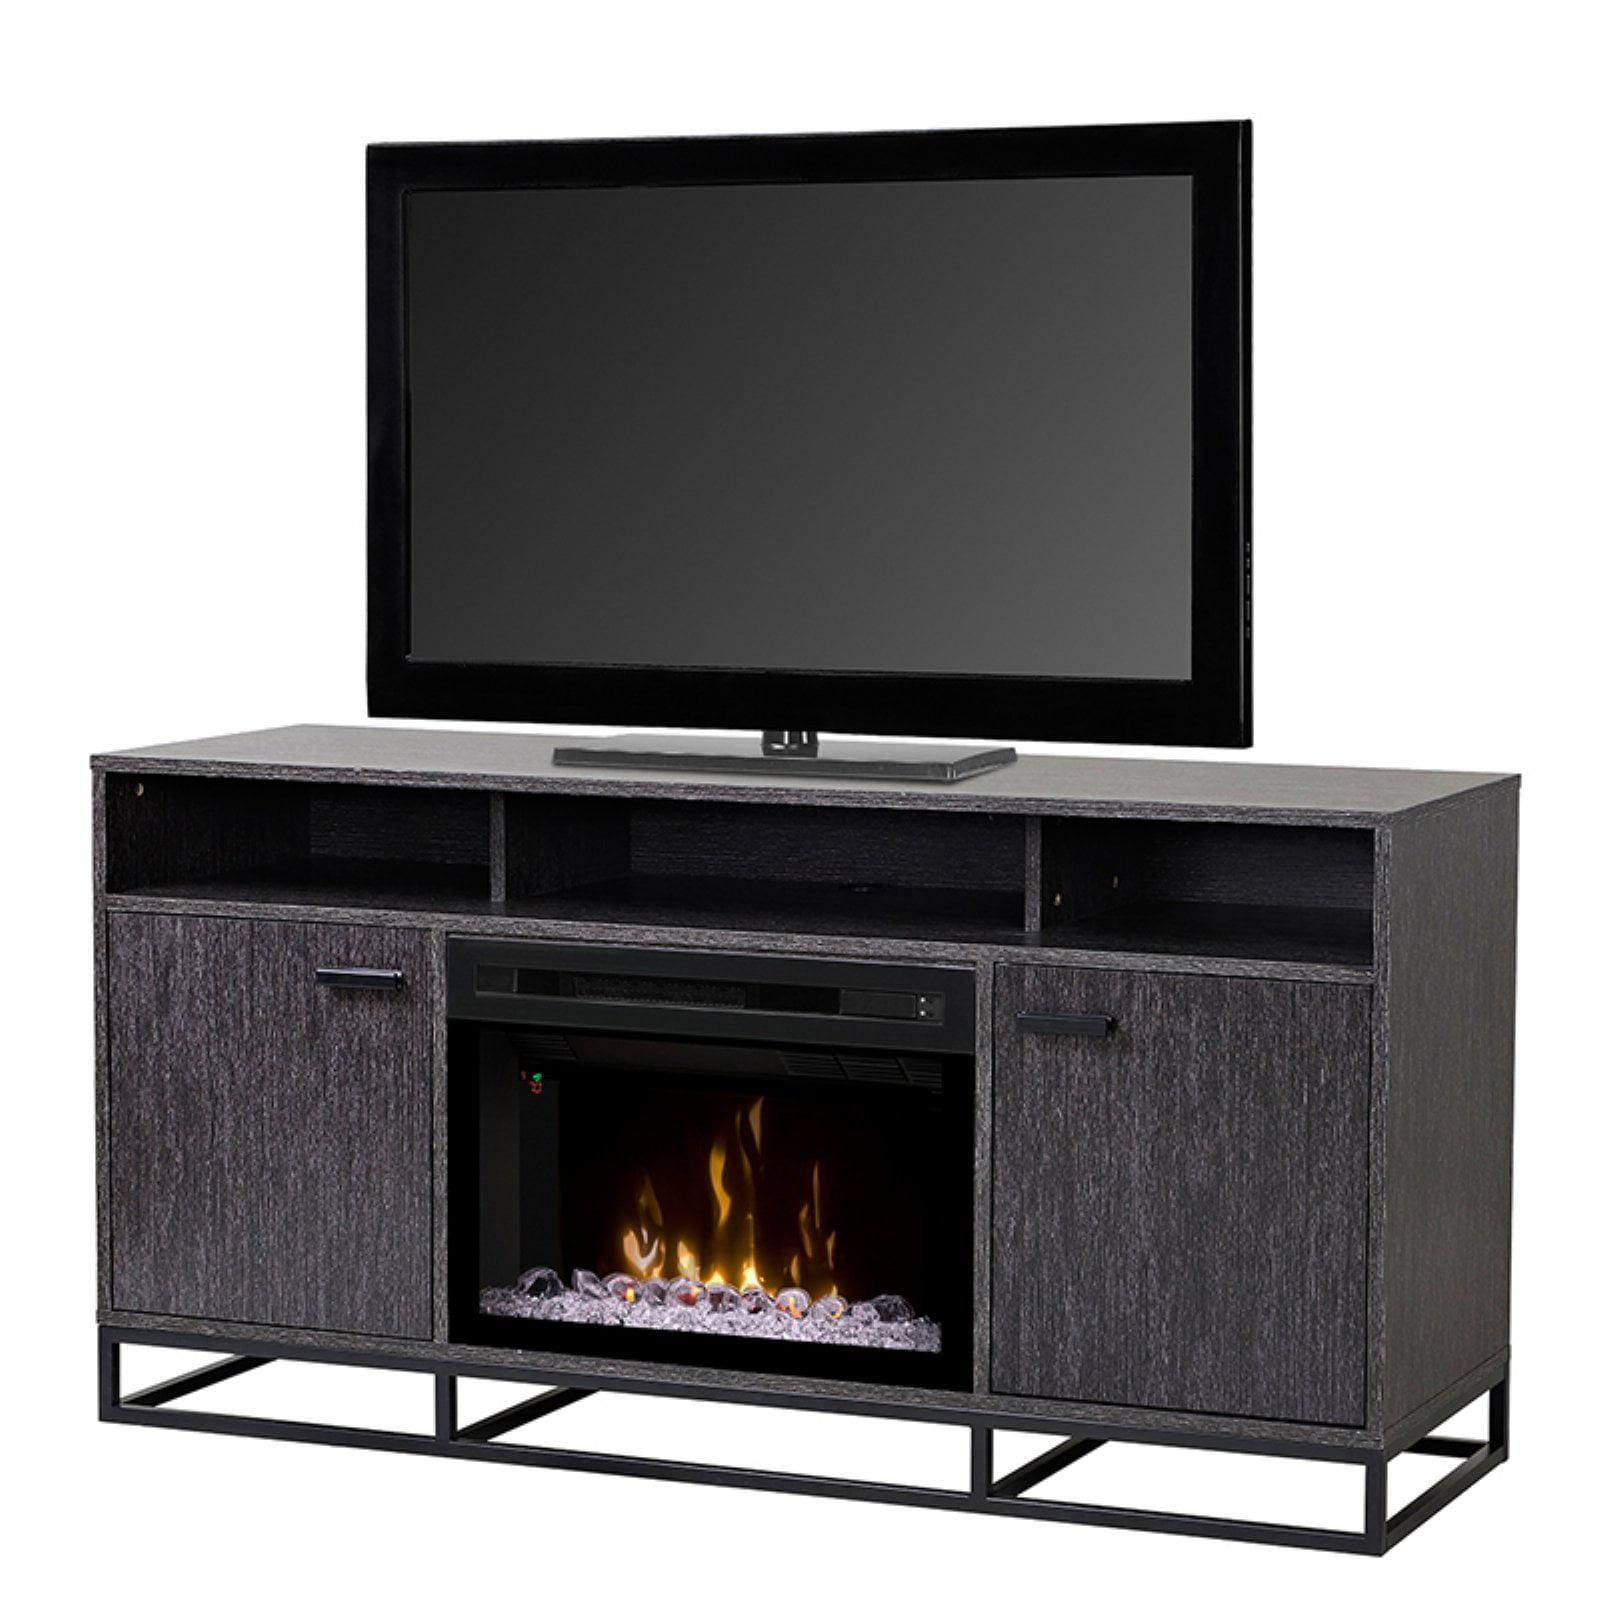 Dimplex Reily Electric Fireplace Tv Stand Walmart Com